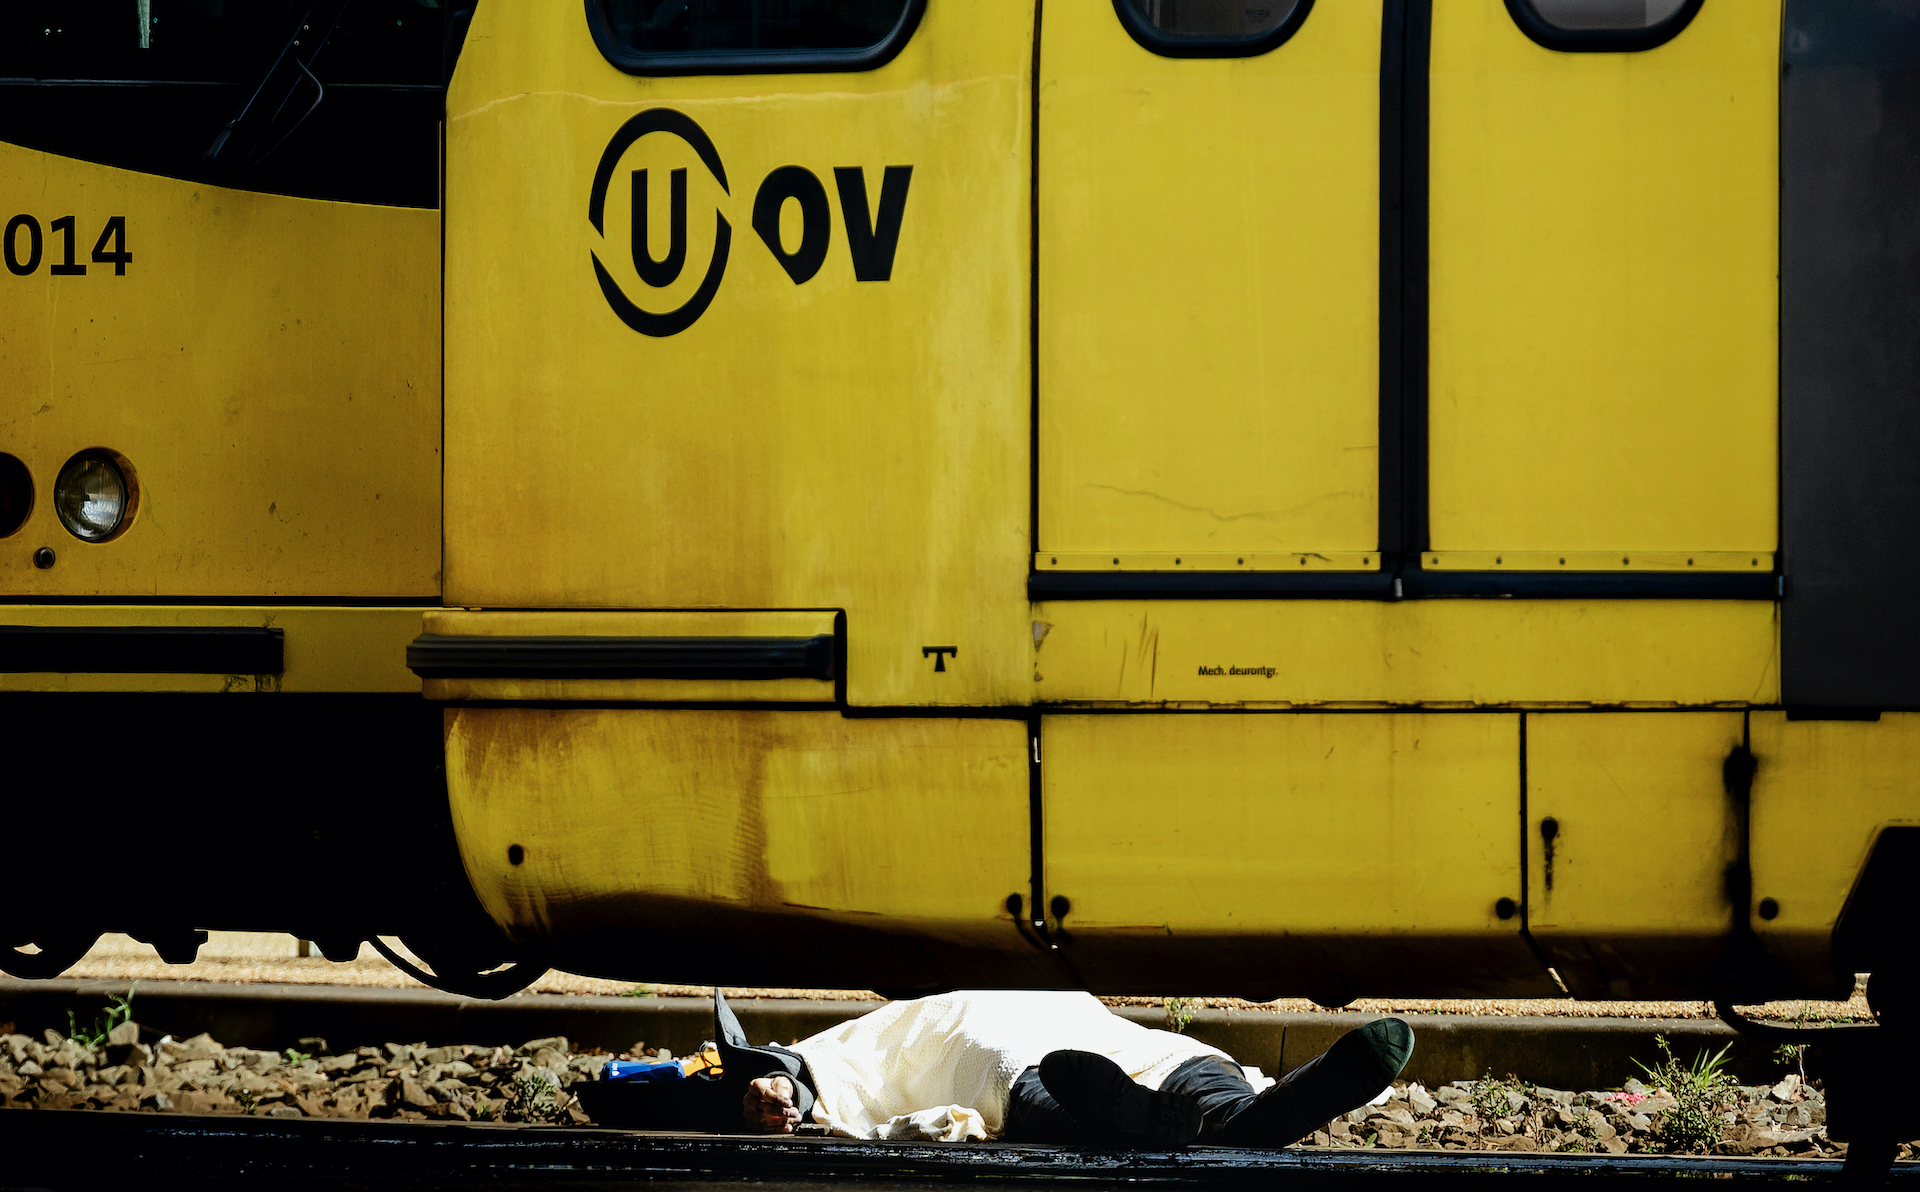 Tramaanslag Utrecht - Robin Lonkhuijsen